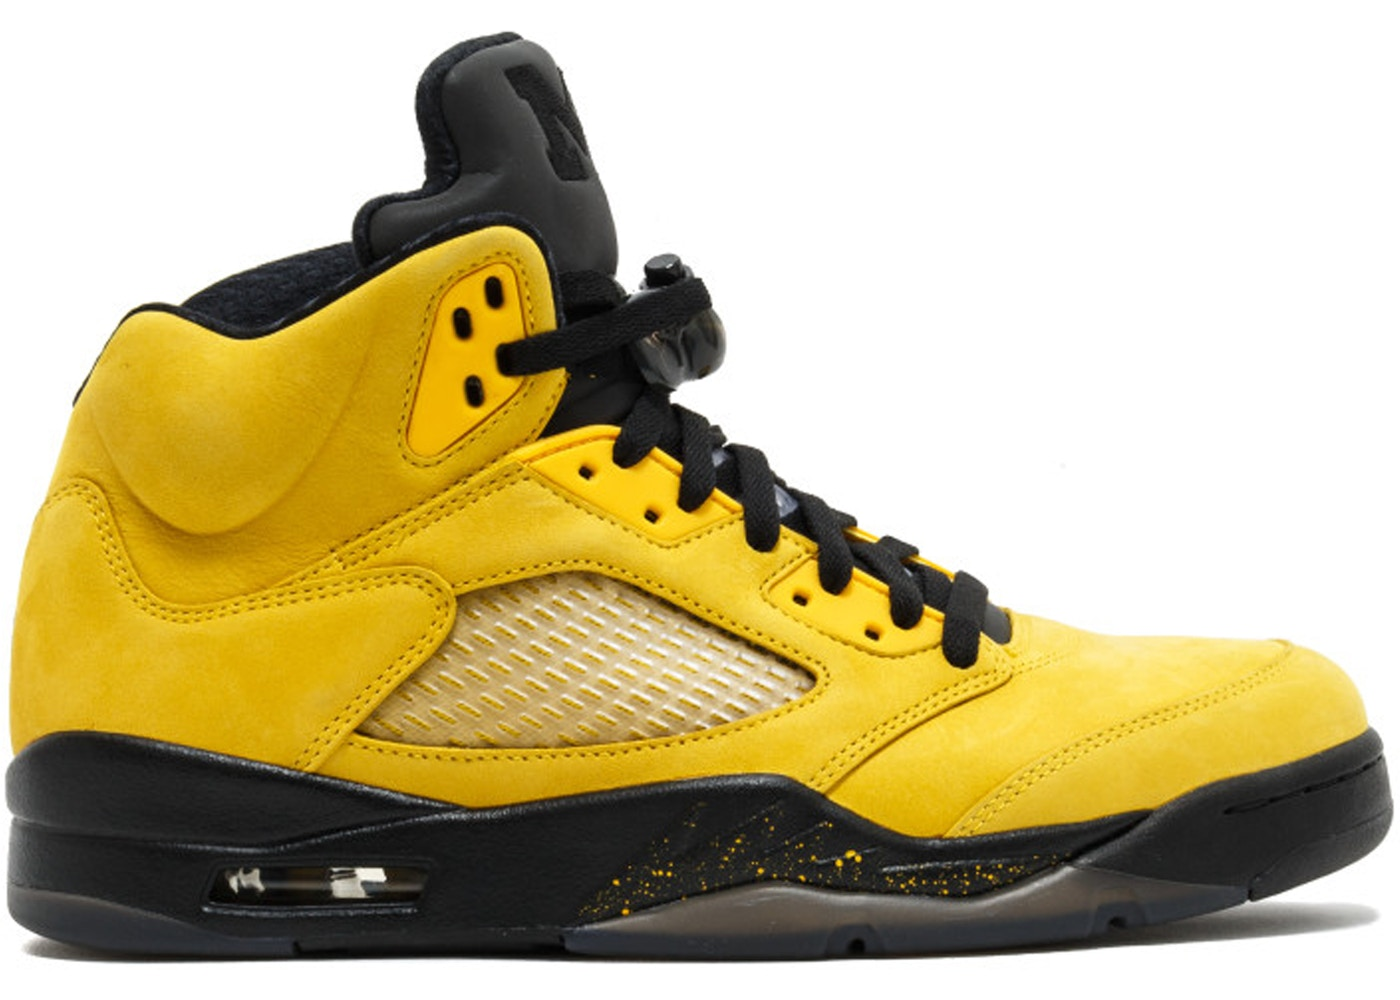 Jordan 5 Retro Fab Five PE -Yellow/Black